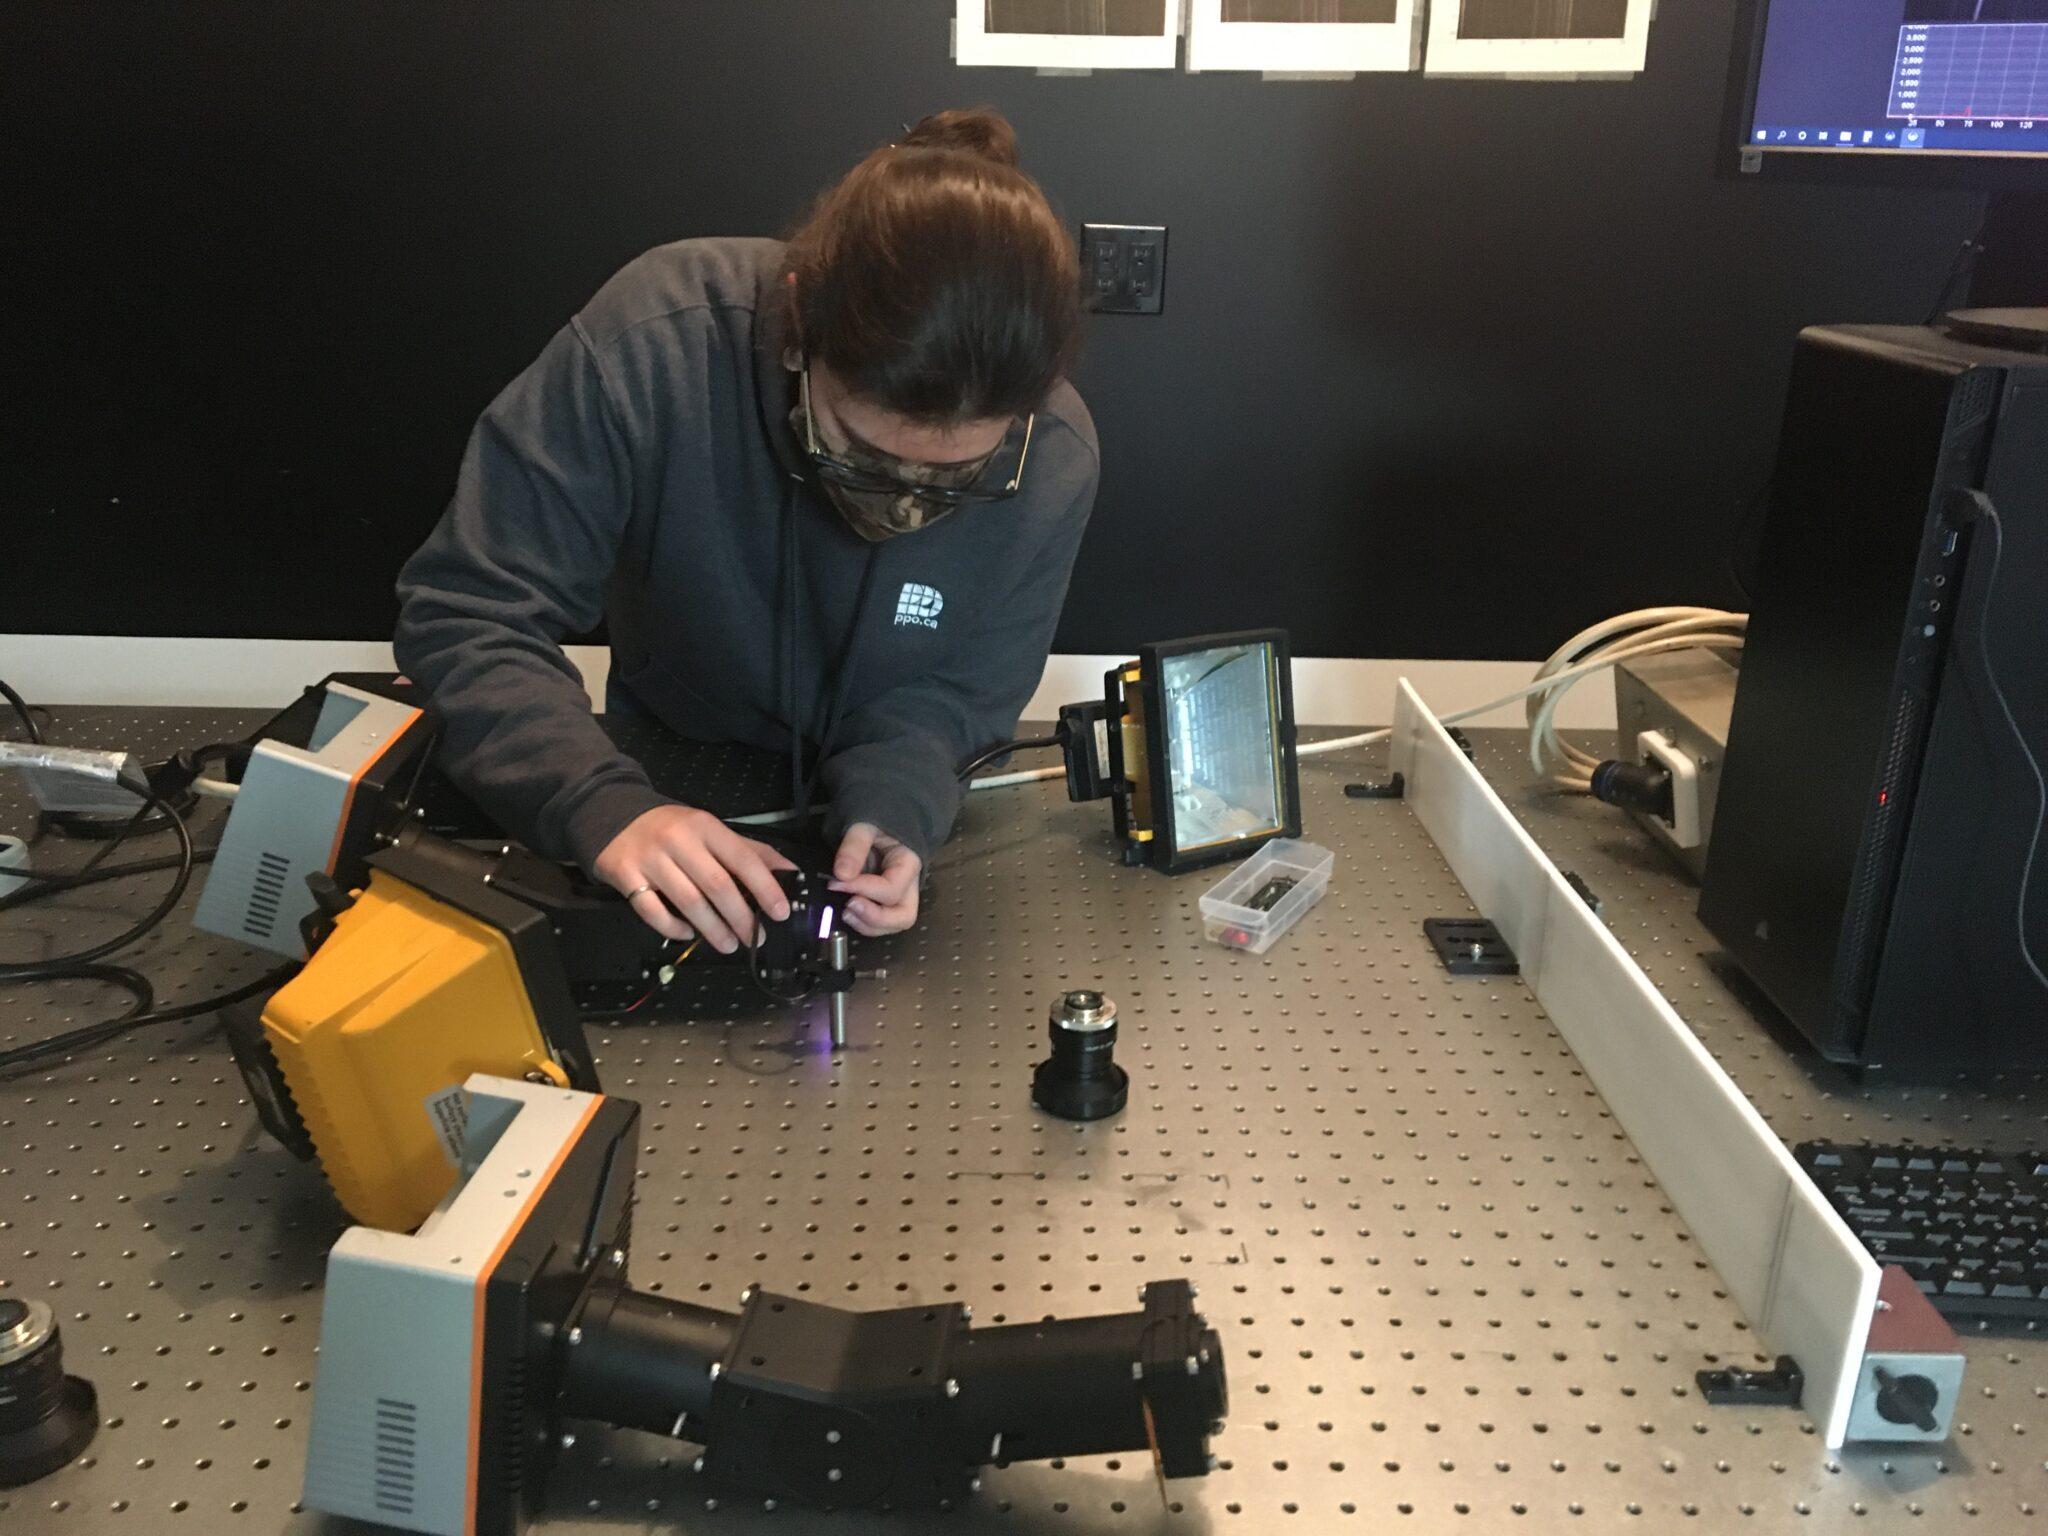 Staff working on spectrometer